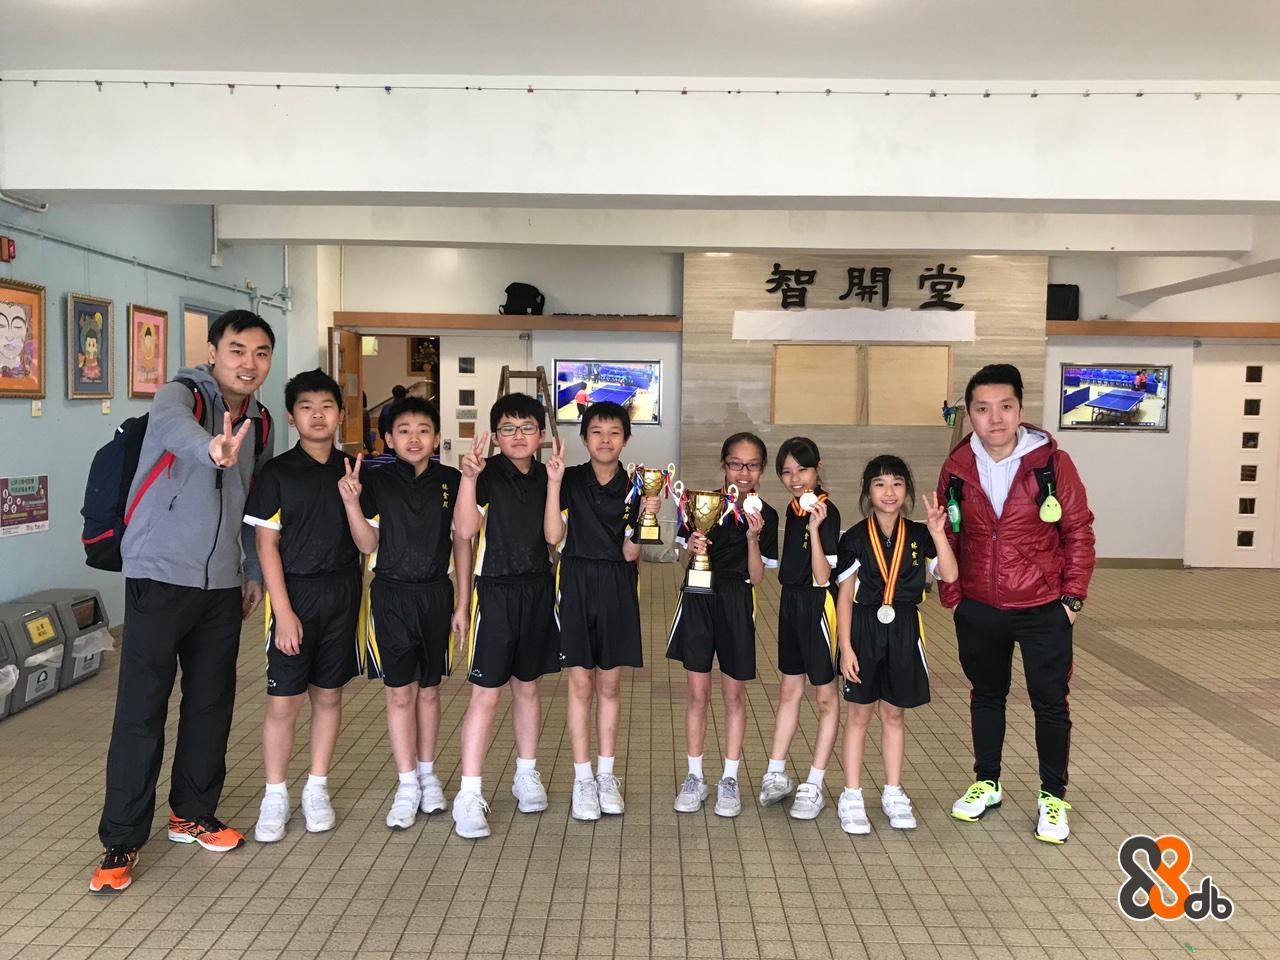 team,sports,high school,secondary school,team sport